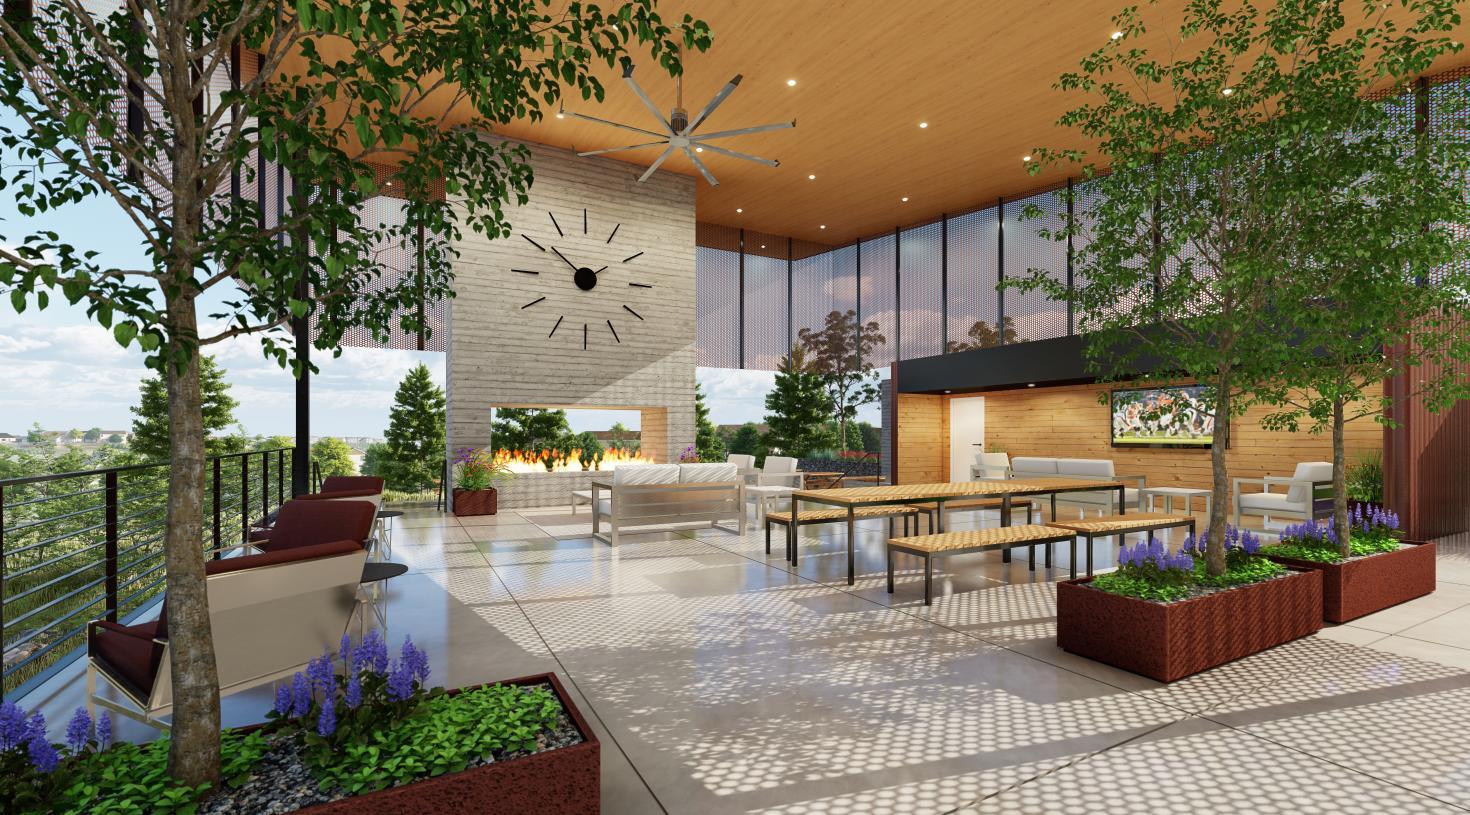 The Spoke Amenity Center outdoor lounge area